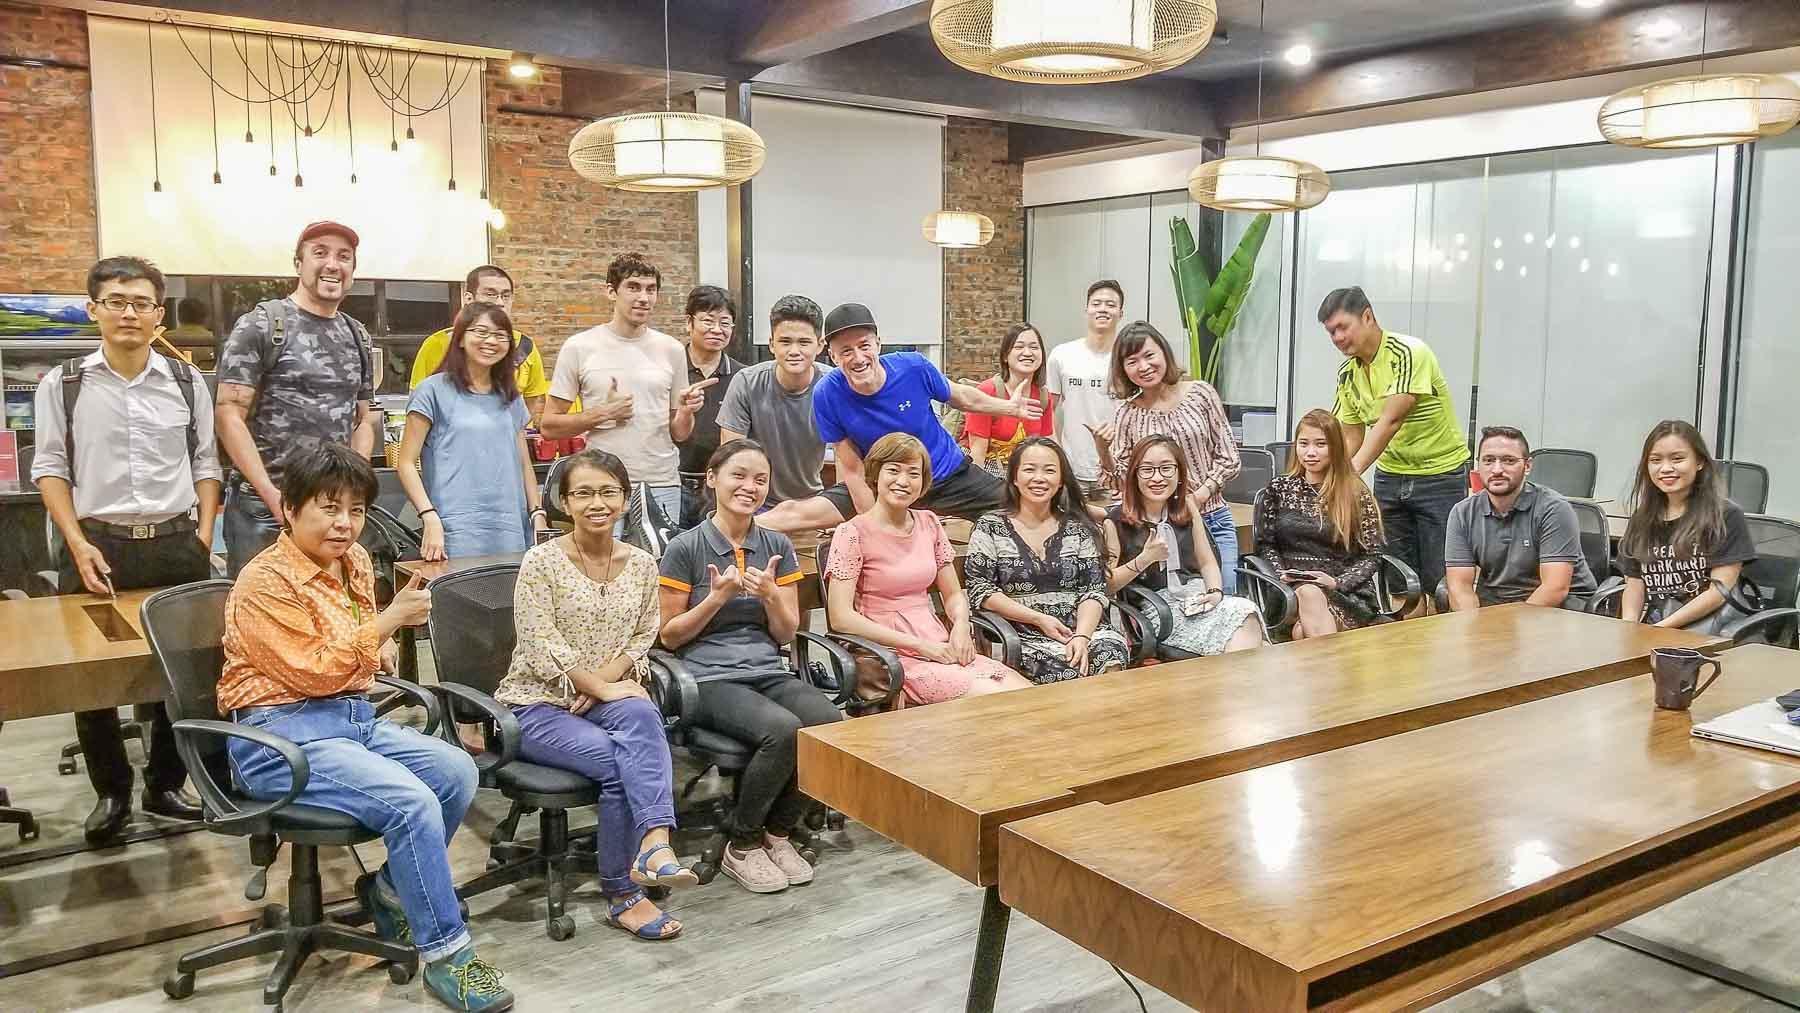 I Wanna Be a Hanoi Tour Guide! Discussed at the Entrepreneur Social Club [tm] Thursday June 14, 2018 hosted by founder Michael Scott Novilla, Hanoi Vietnam